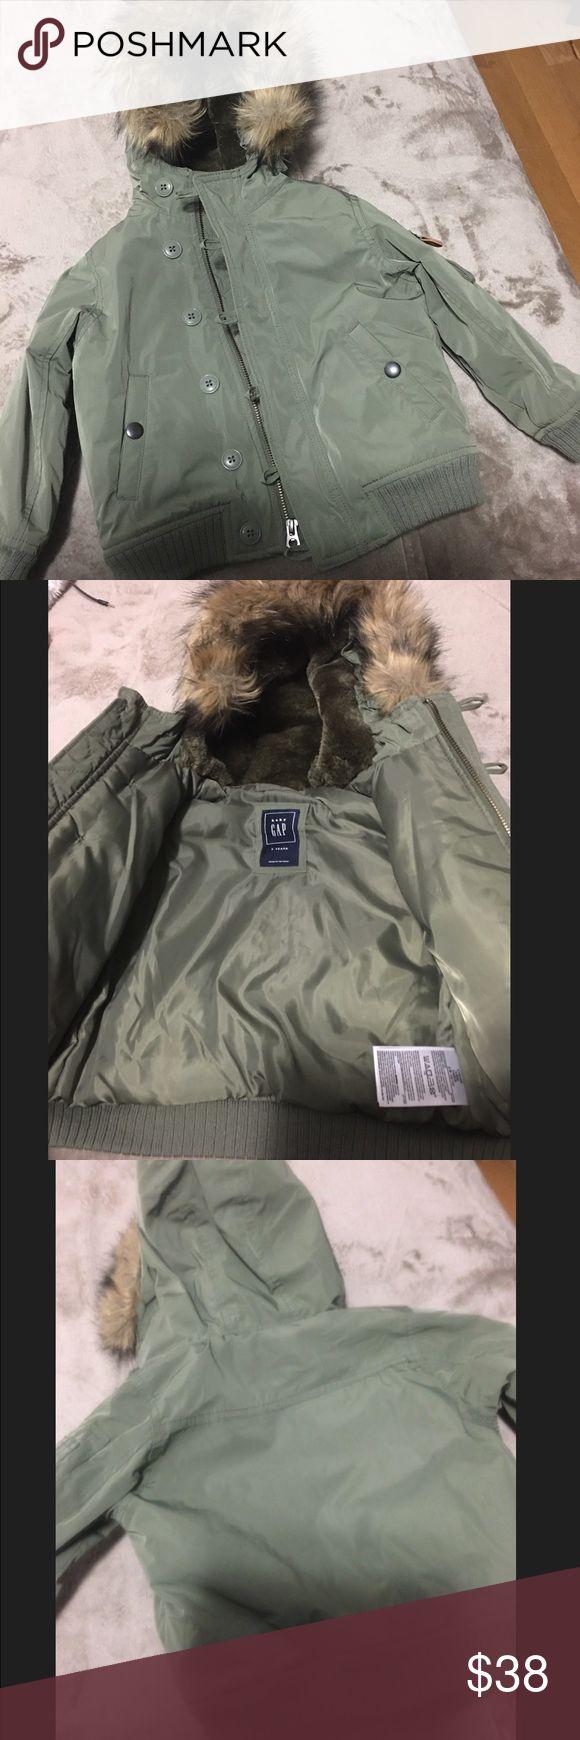 GAP toddler boy bomber jacket - size 3yrs like new Like new condition. Military bomber. Size 3 years. GAP Jackets & Coats